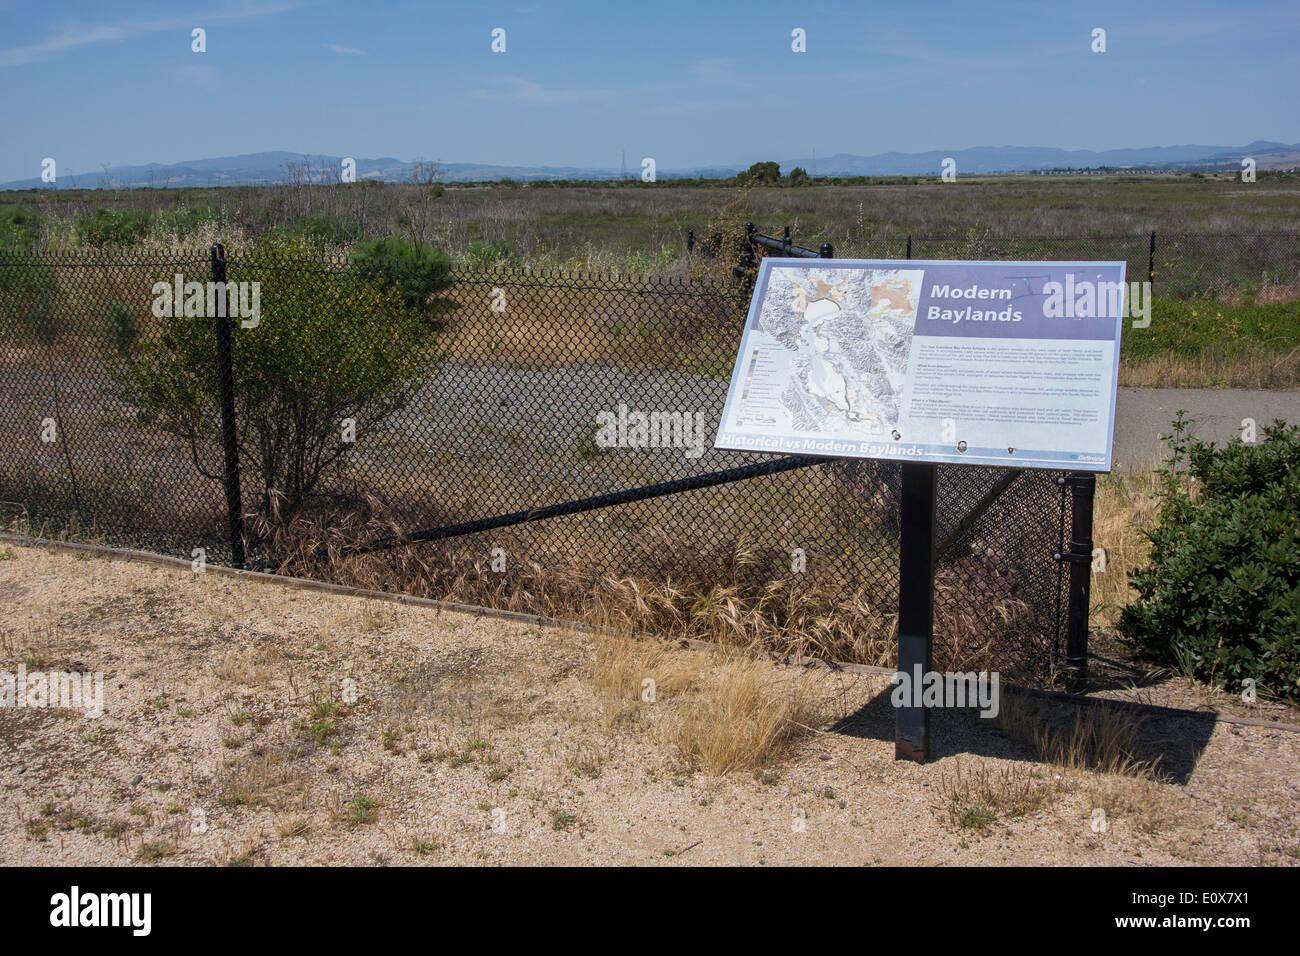 interpretive sign at the San Pablo Bay wildlife refuge, California - Stock Image